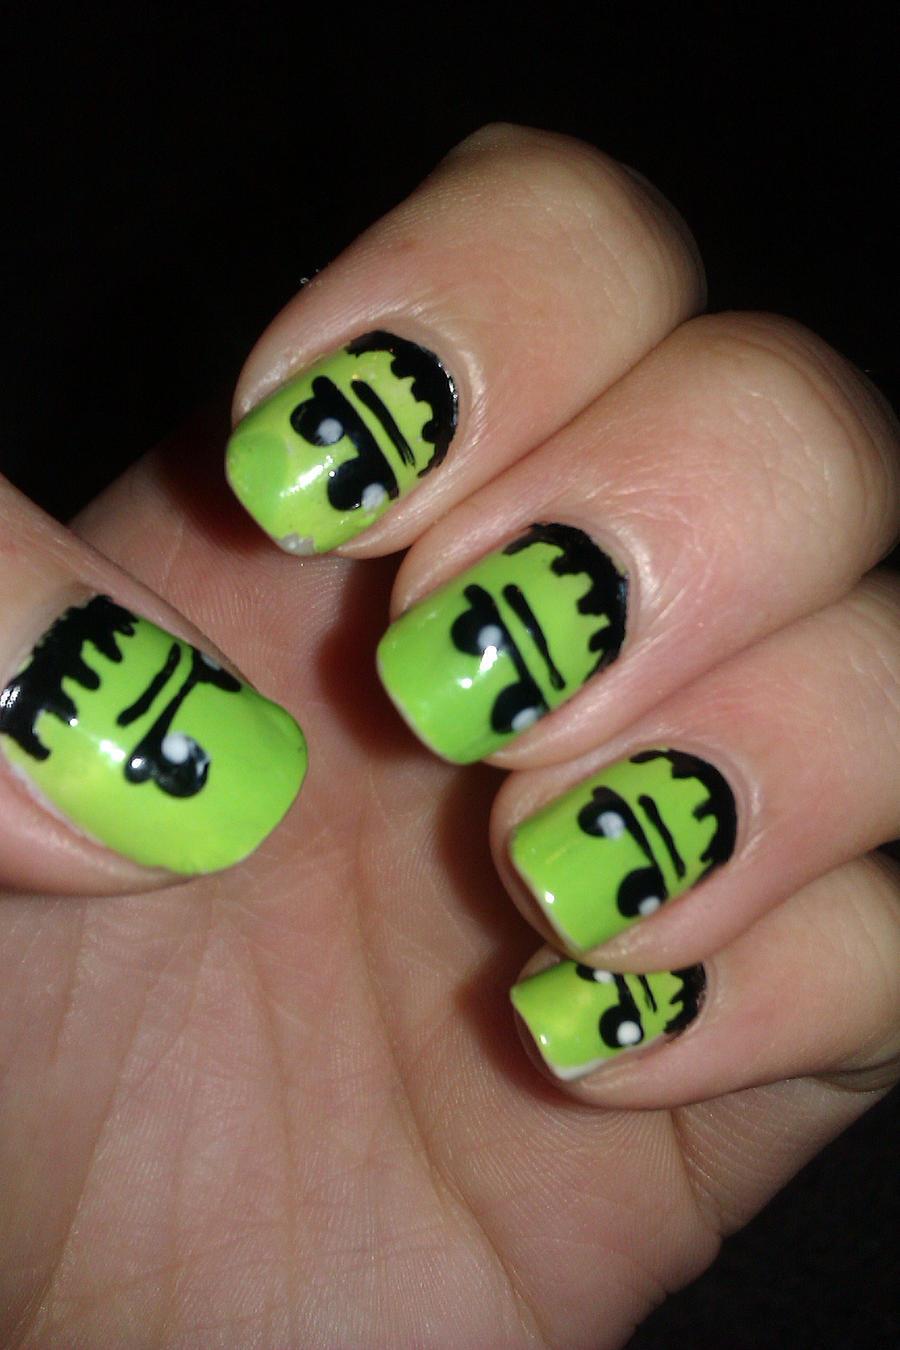 Frankenstein nails by LittleMissTass Frankenstein nails by LittleMissTass - Frankenstein Nails By LittleMissTass On DeviantArt